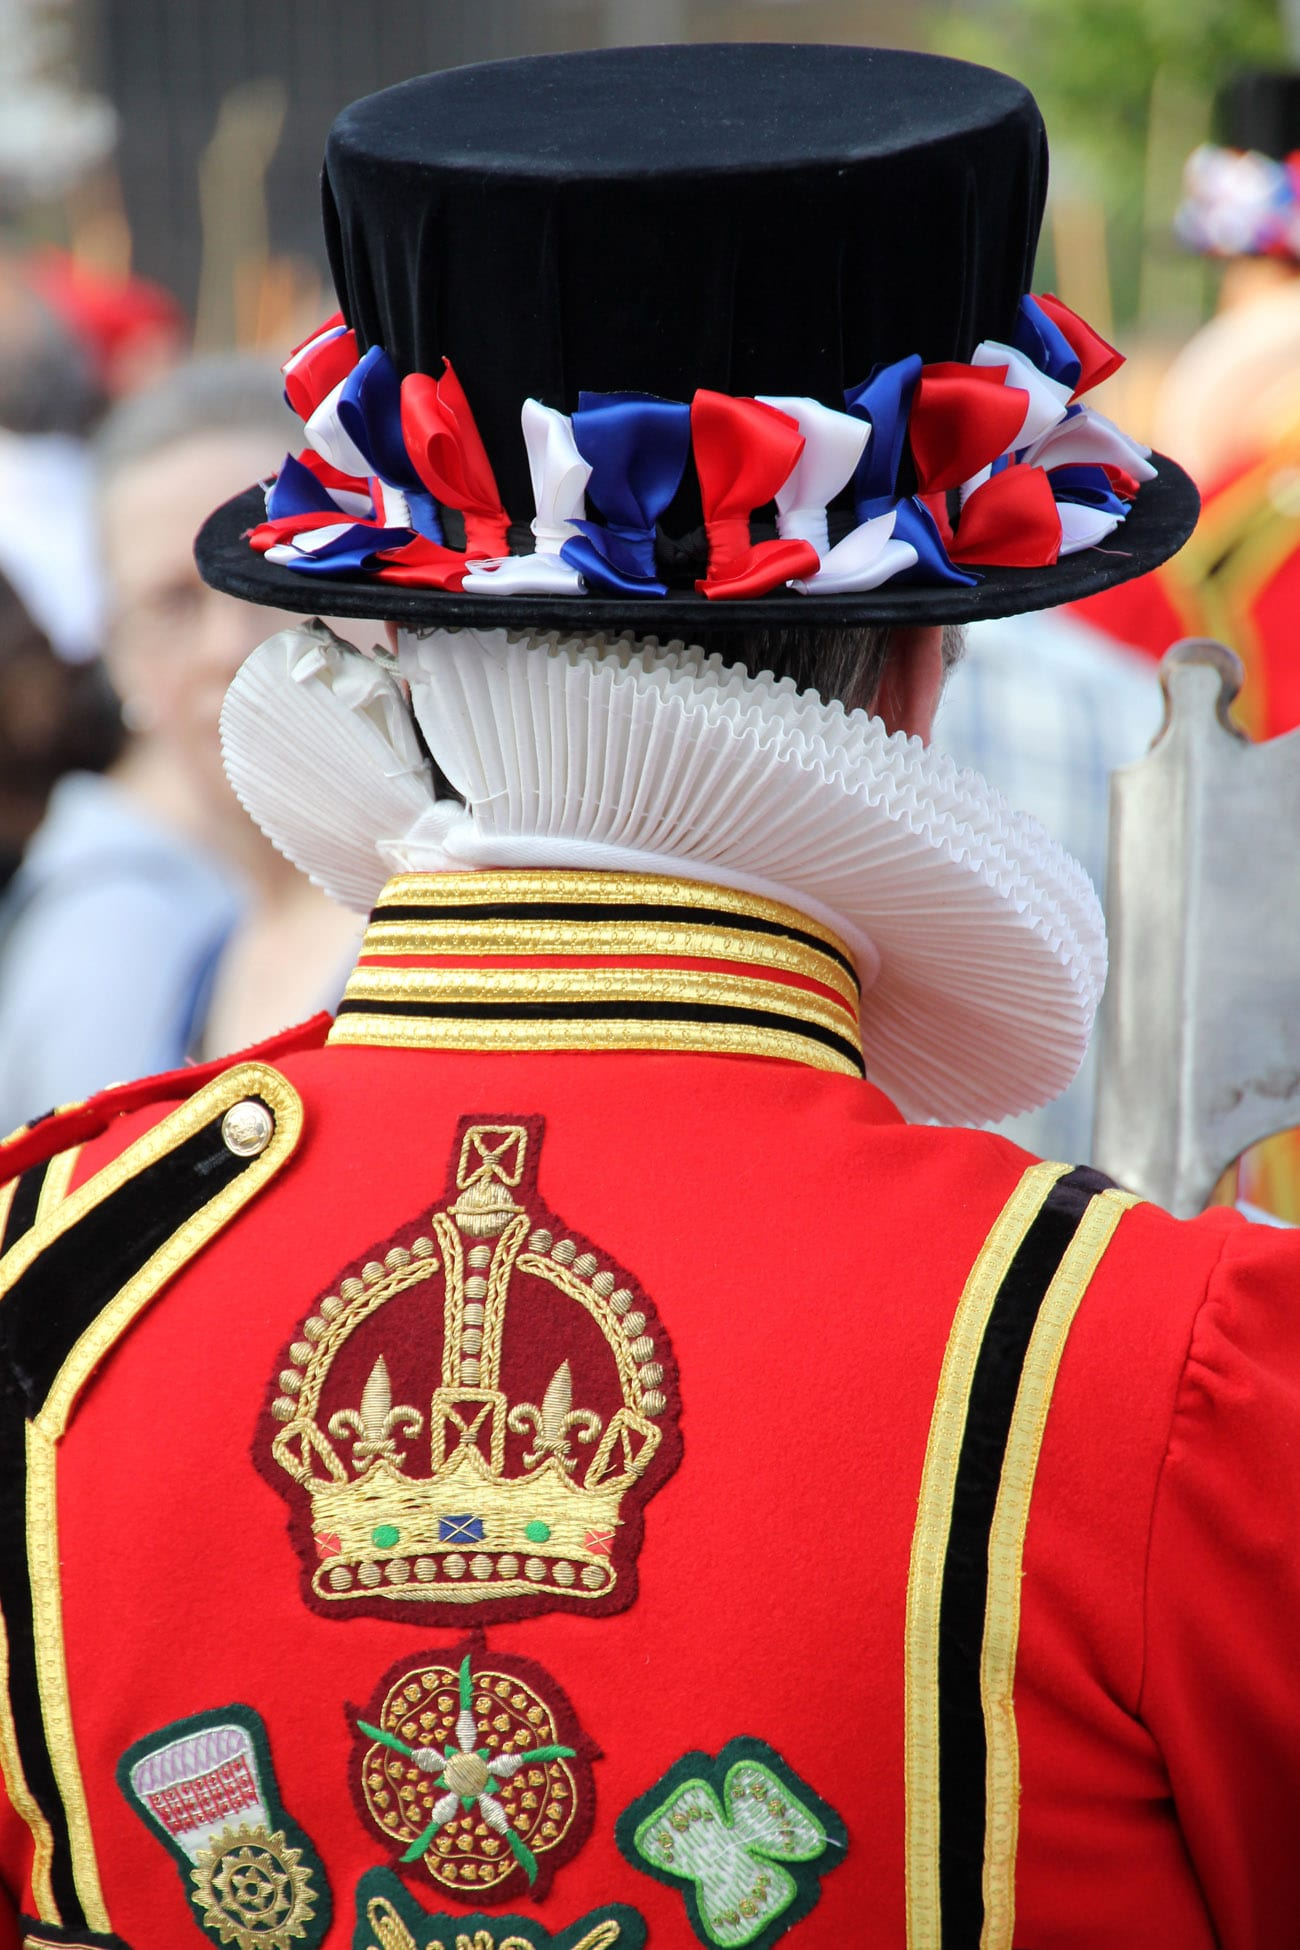 Guardia de la torre de Londres